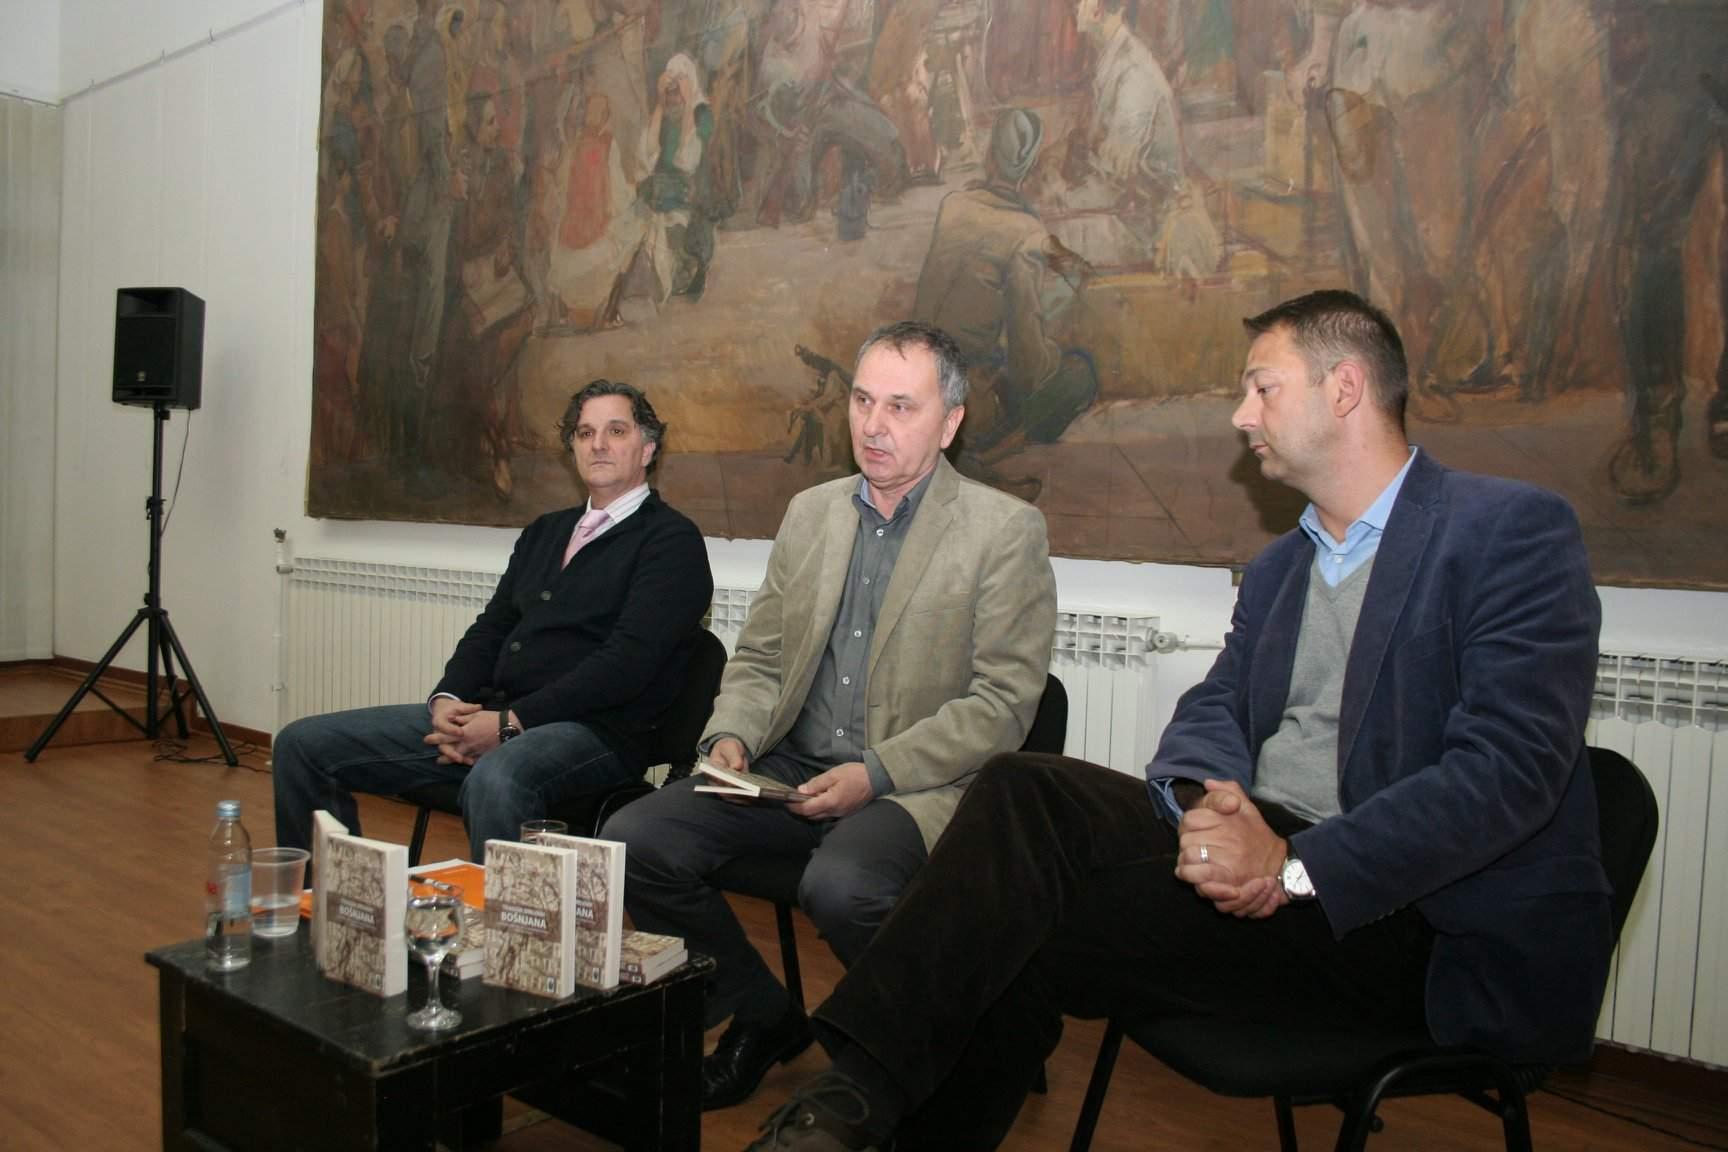 tz2.jpg - Đenan Galešić: Počeci osporavanja bosanske države i identiteta